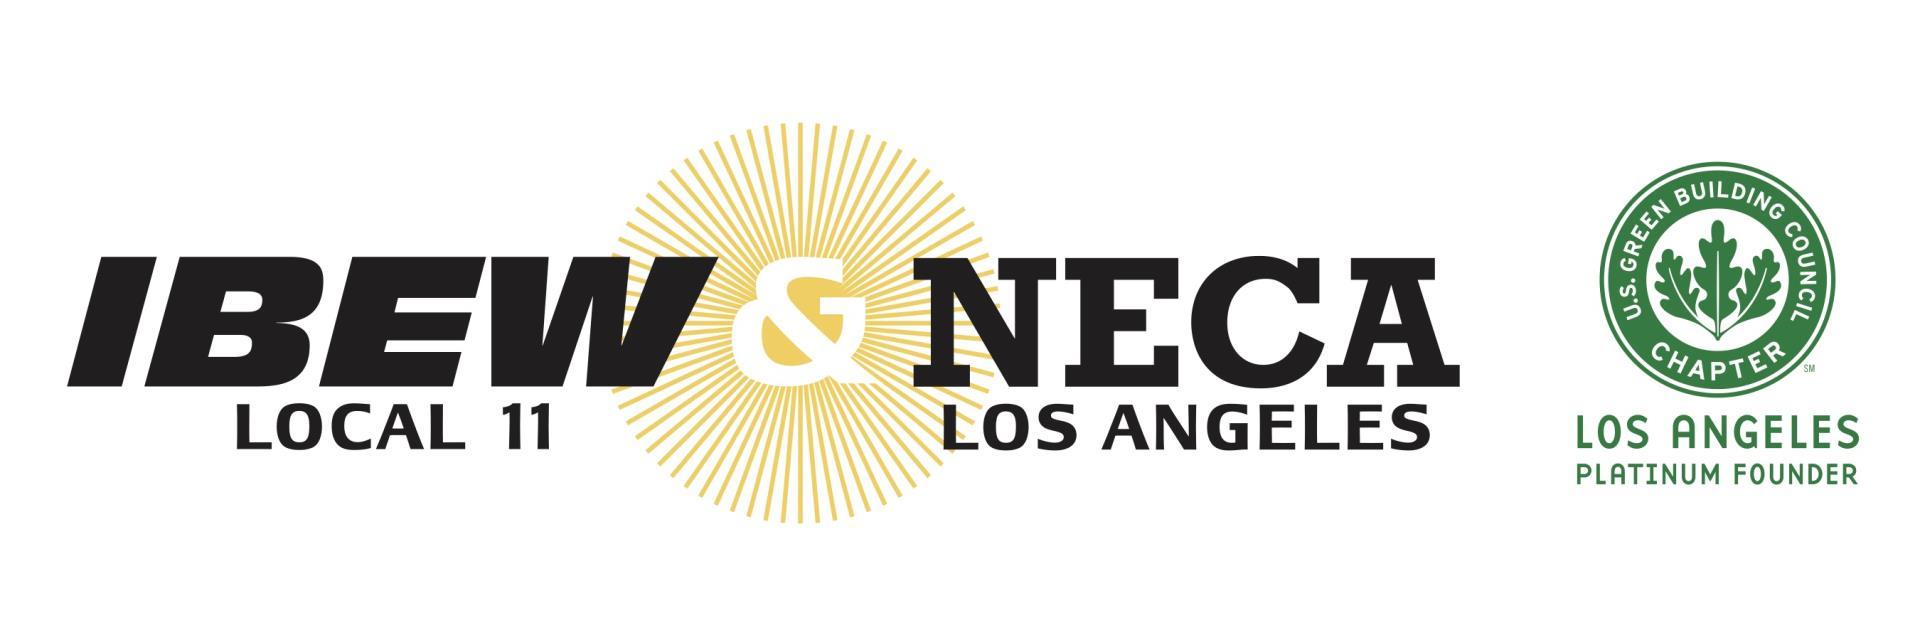 IBEWNECA logo new